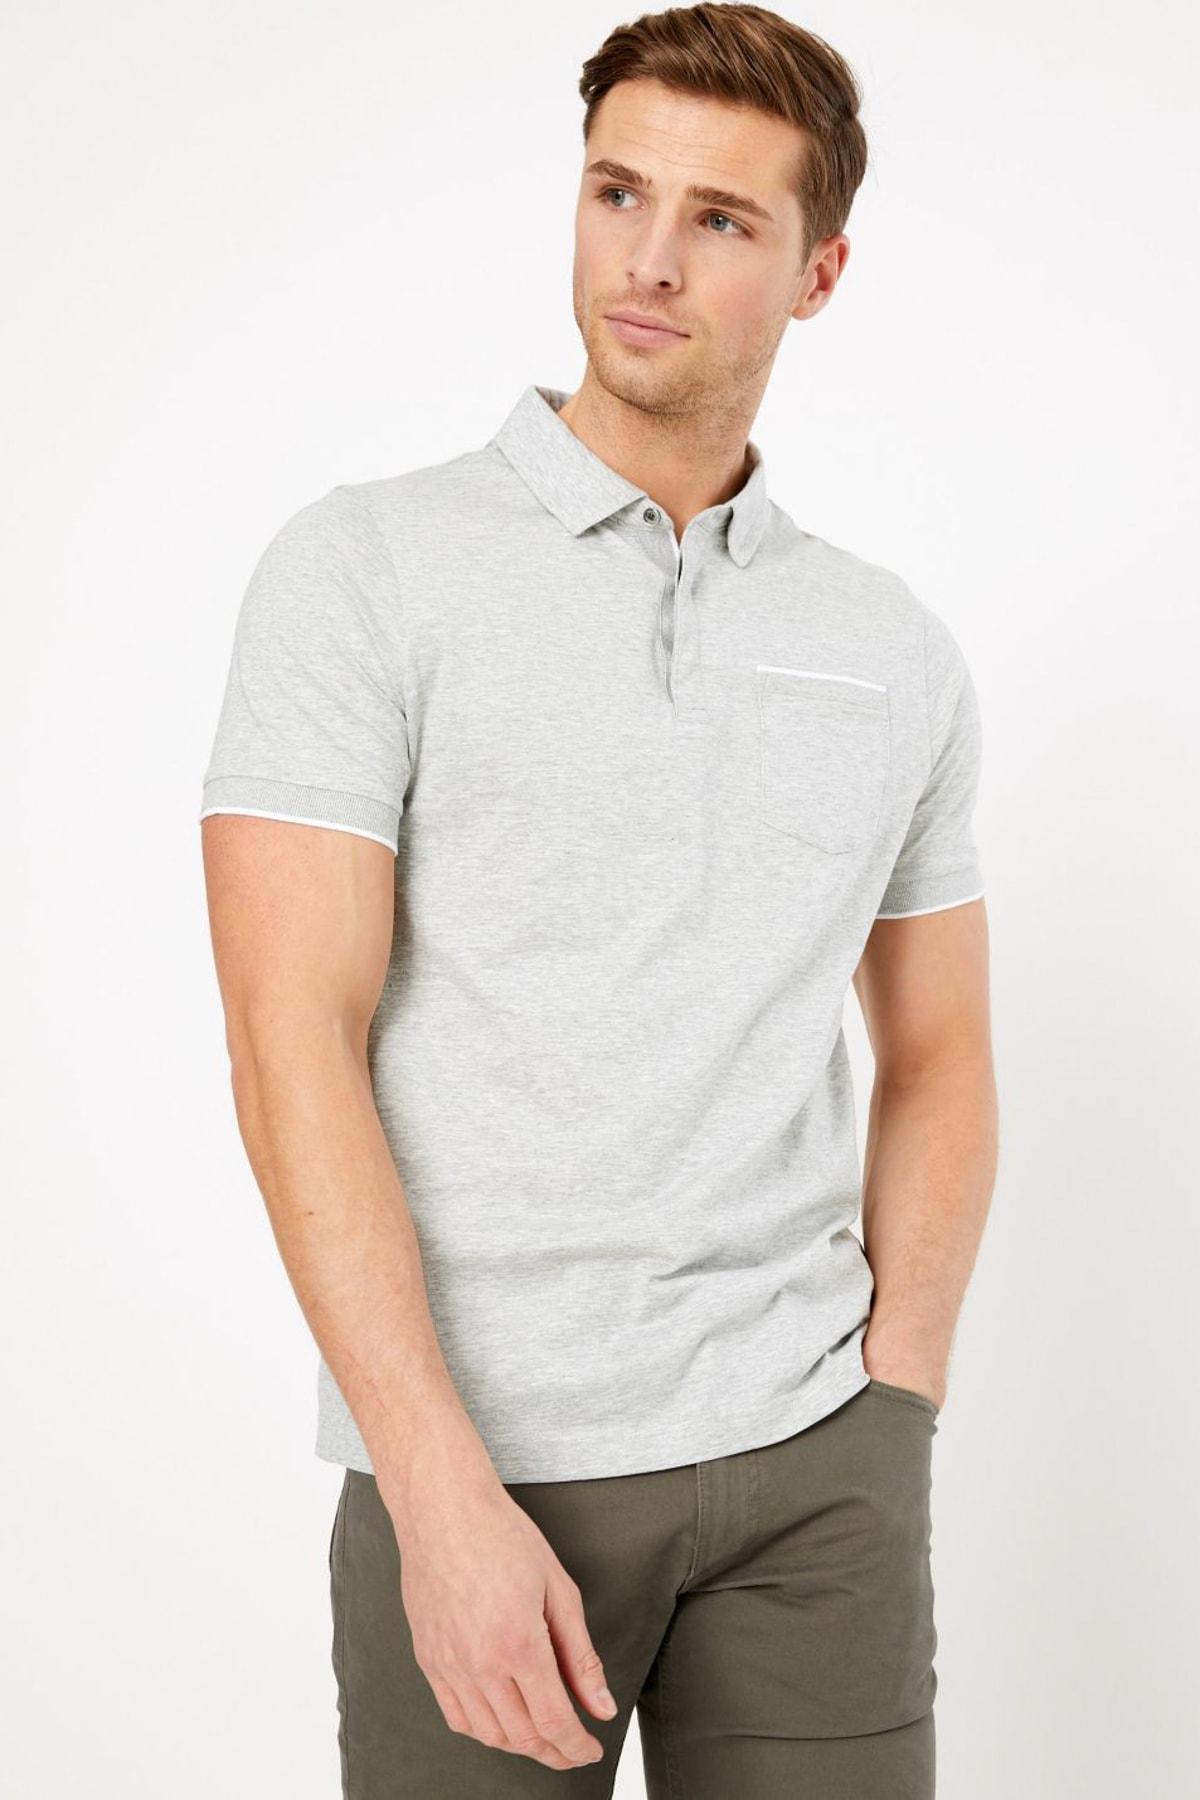 Marks & Spencer Erkek Gri Kısa Kollu Polo Yaka T-Shirt T28004885A 1